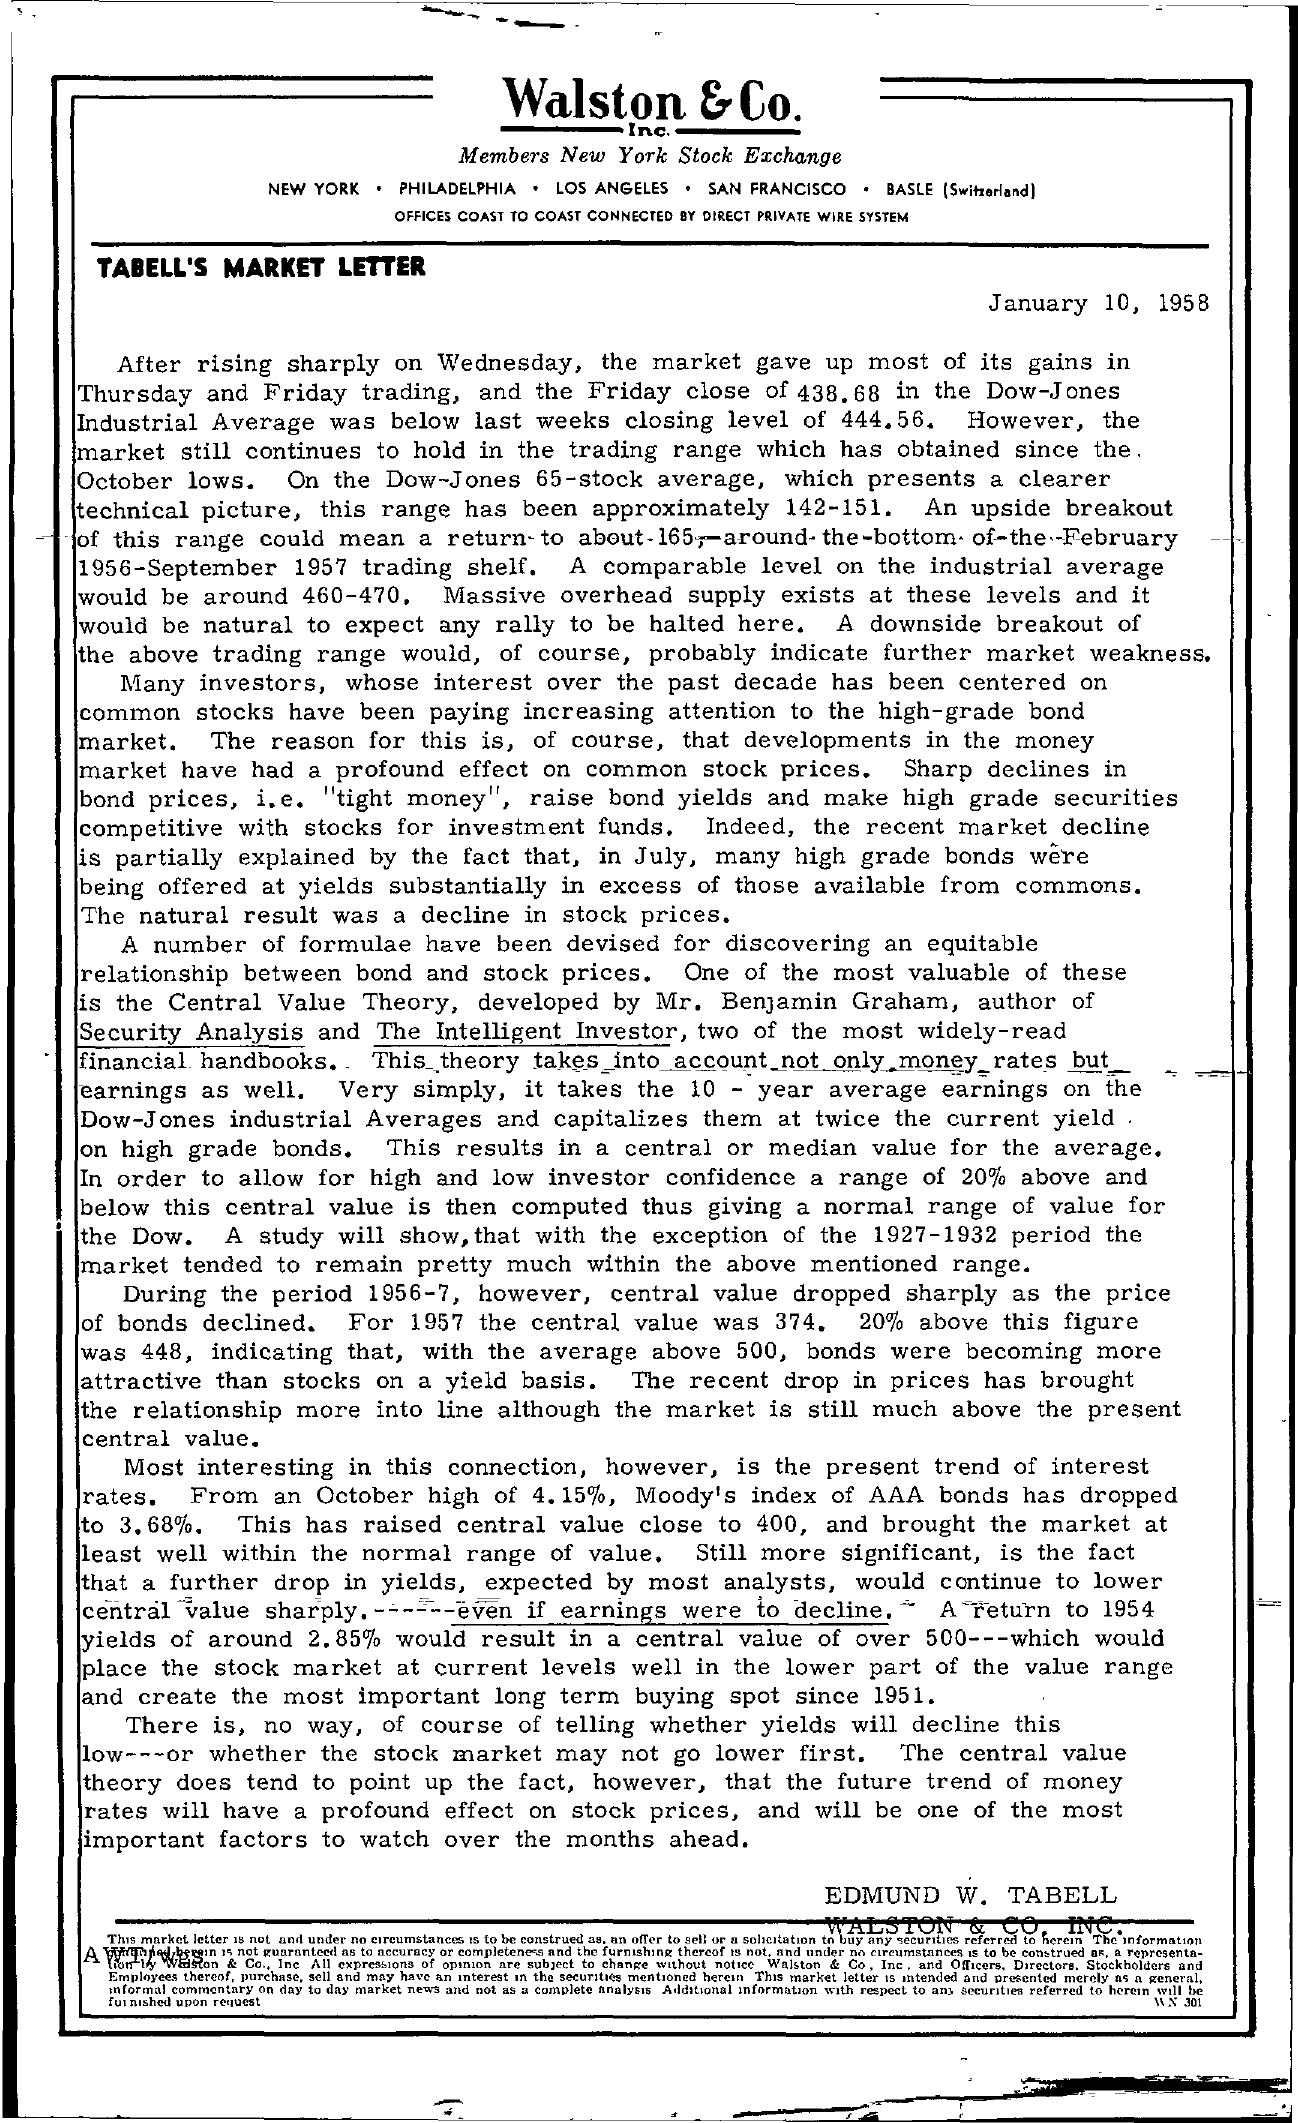 Tabell's Market Letter - January 10, 1958